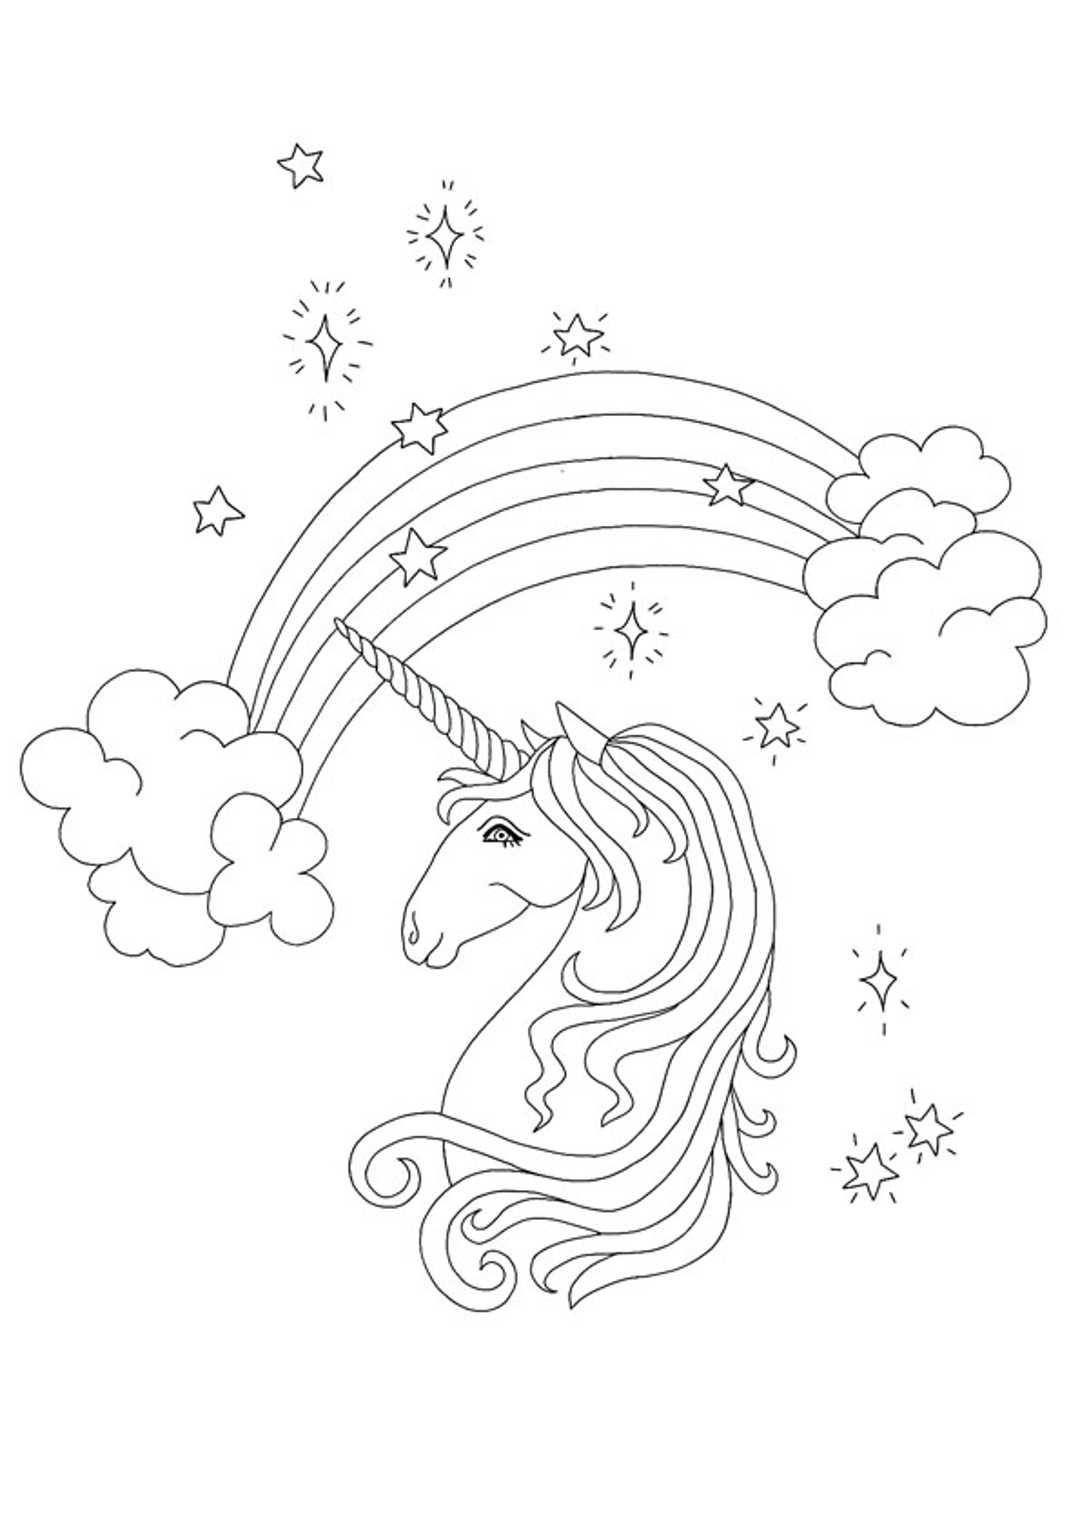 Unicorn Head Coloring Pages Unicorn Coloring Pages Mandala Coloring Pages Mermaid Coloring Pages [ 1528 x 1080 Pixel ]